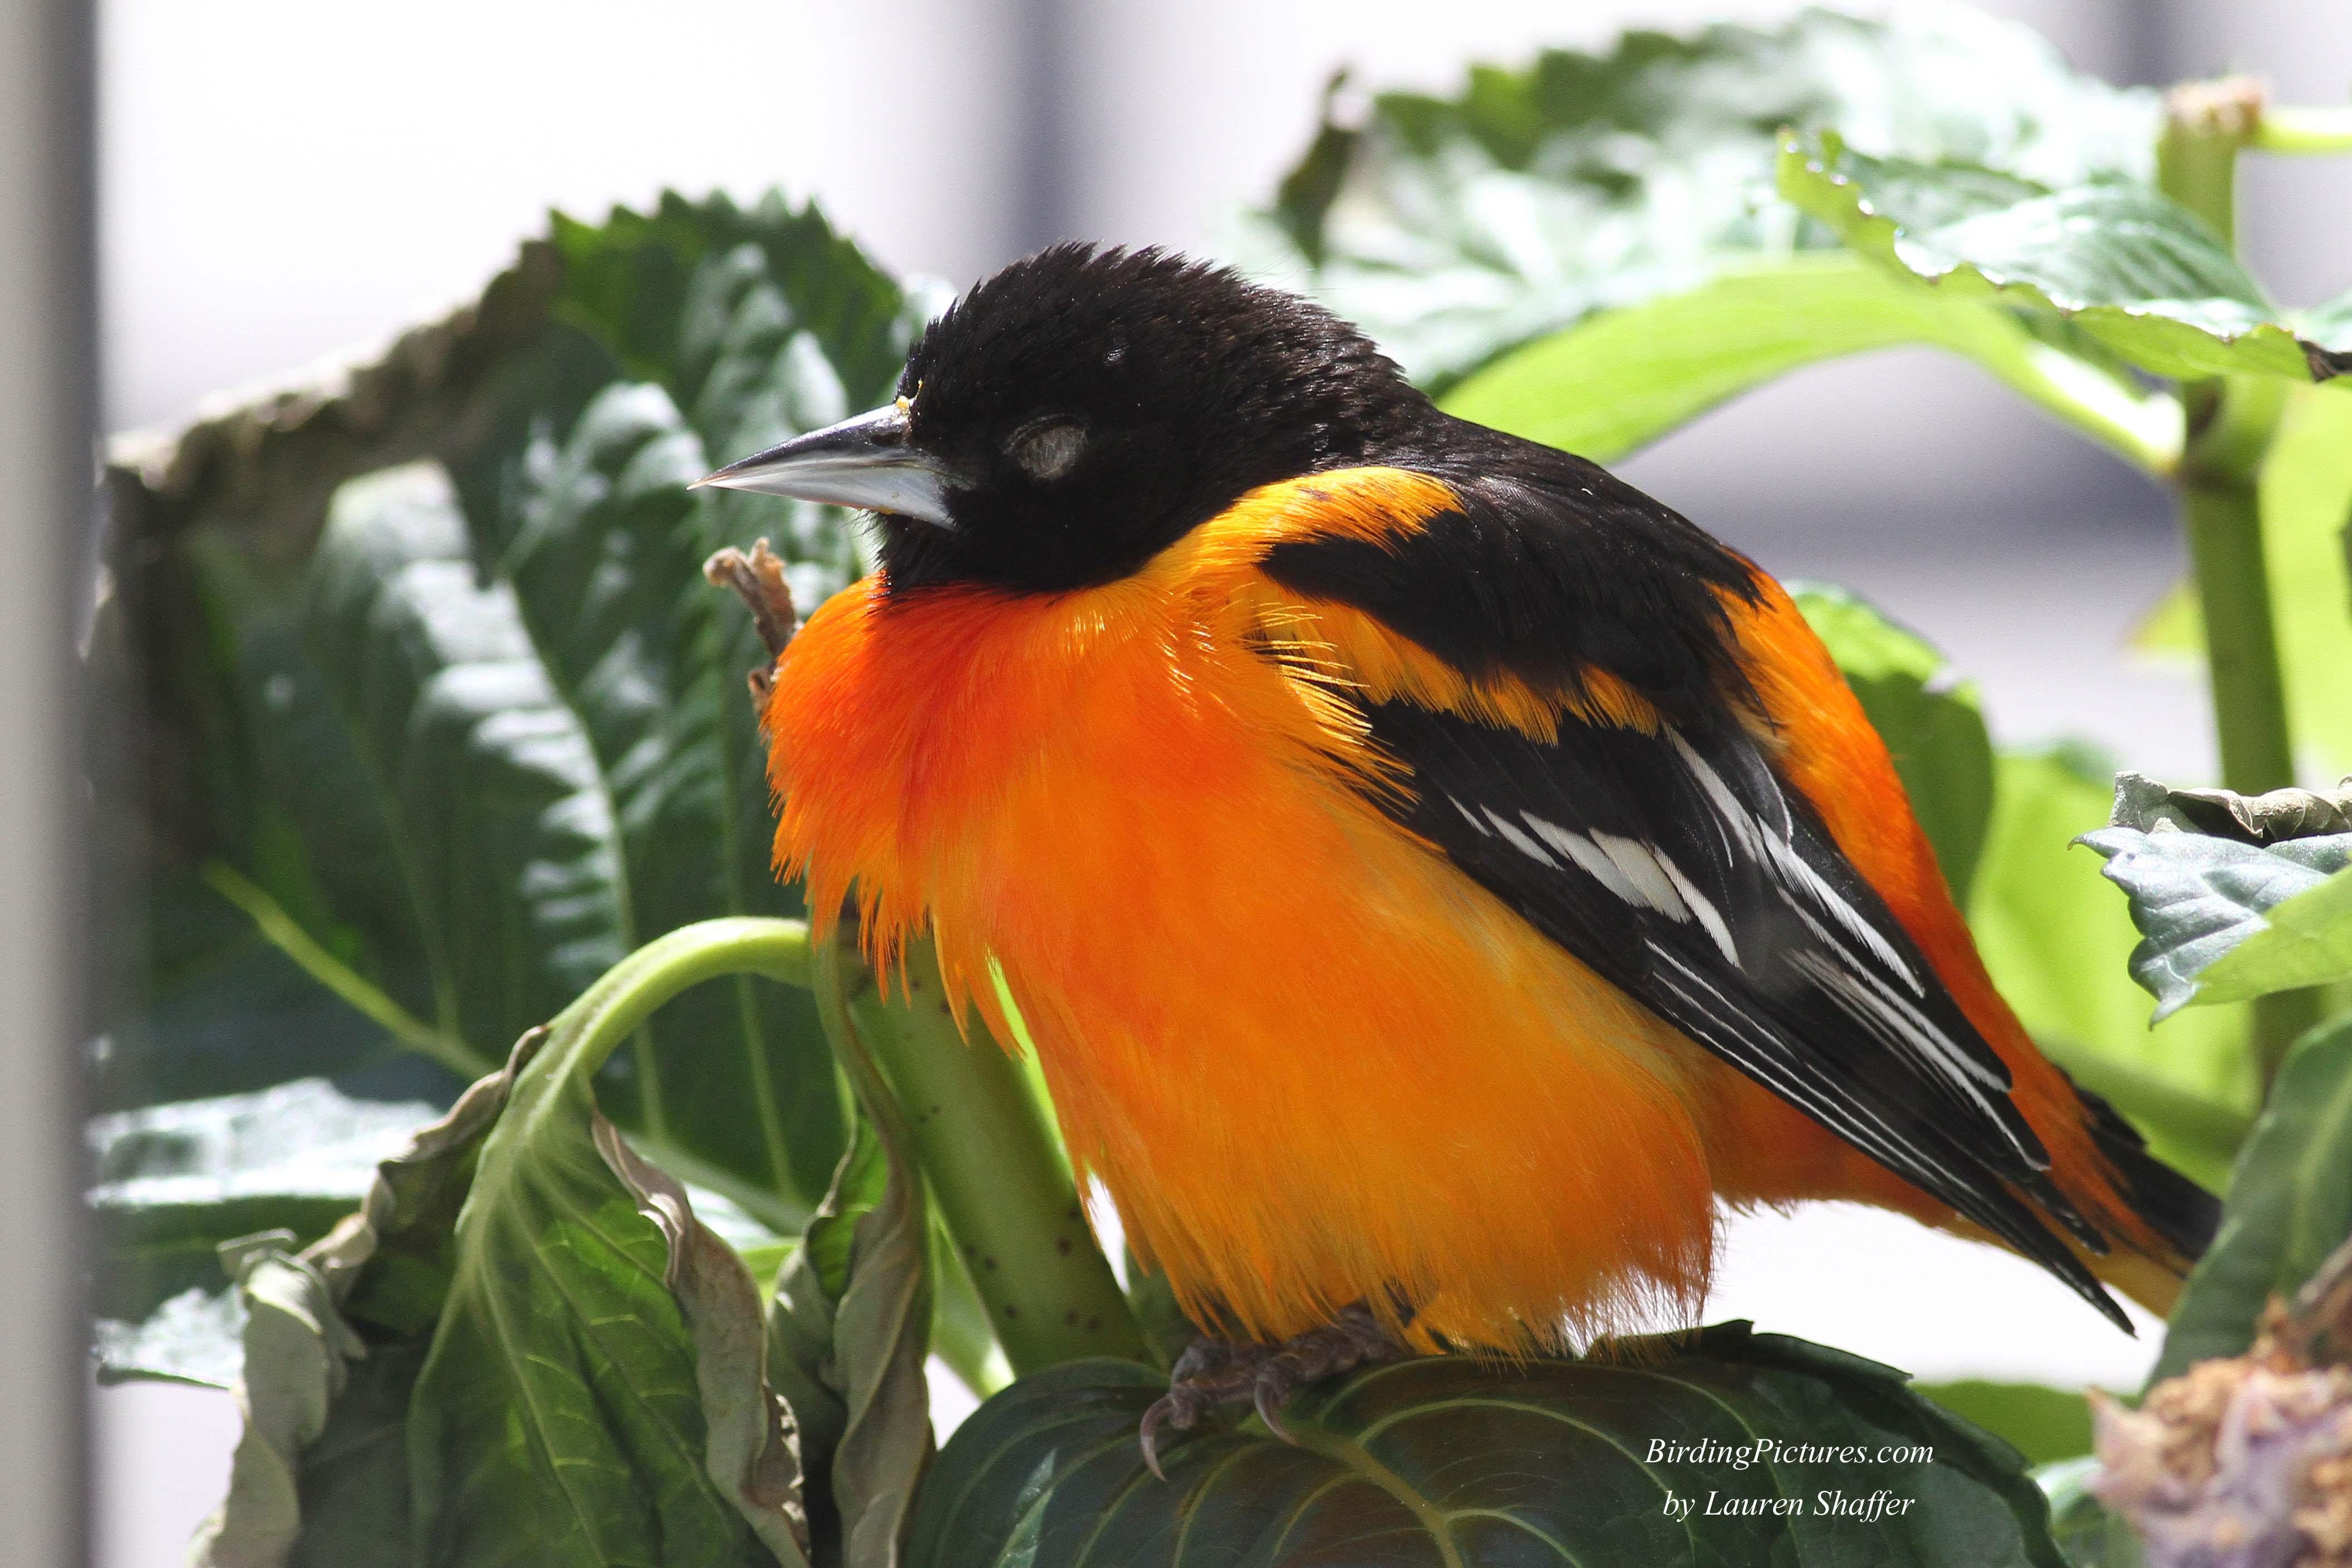 Cómo Atraer Orioles | Atraer aves - Pájaros & amp; Florece